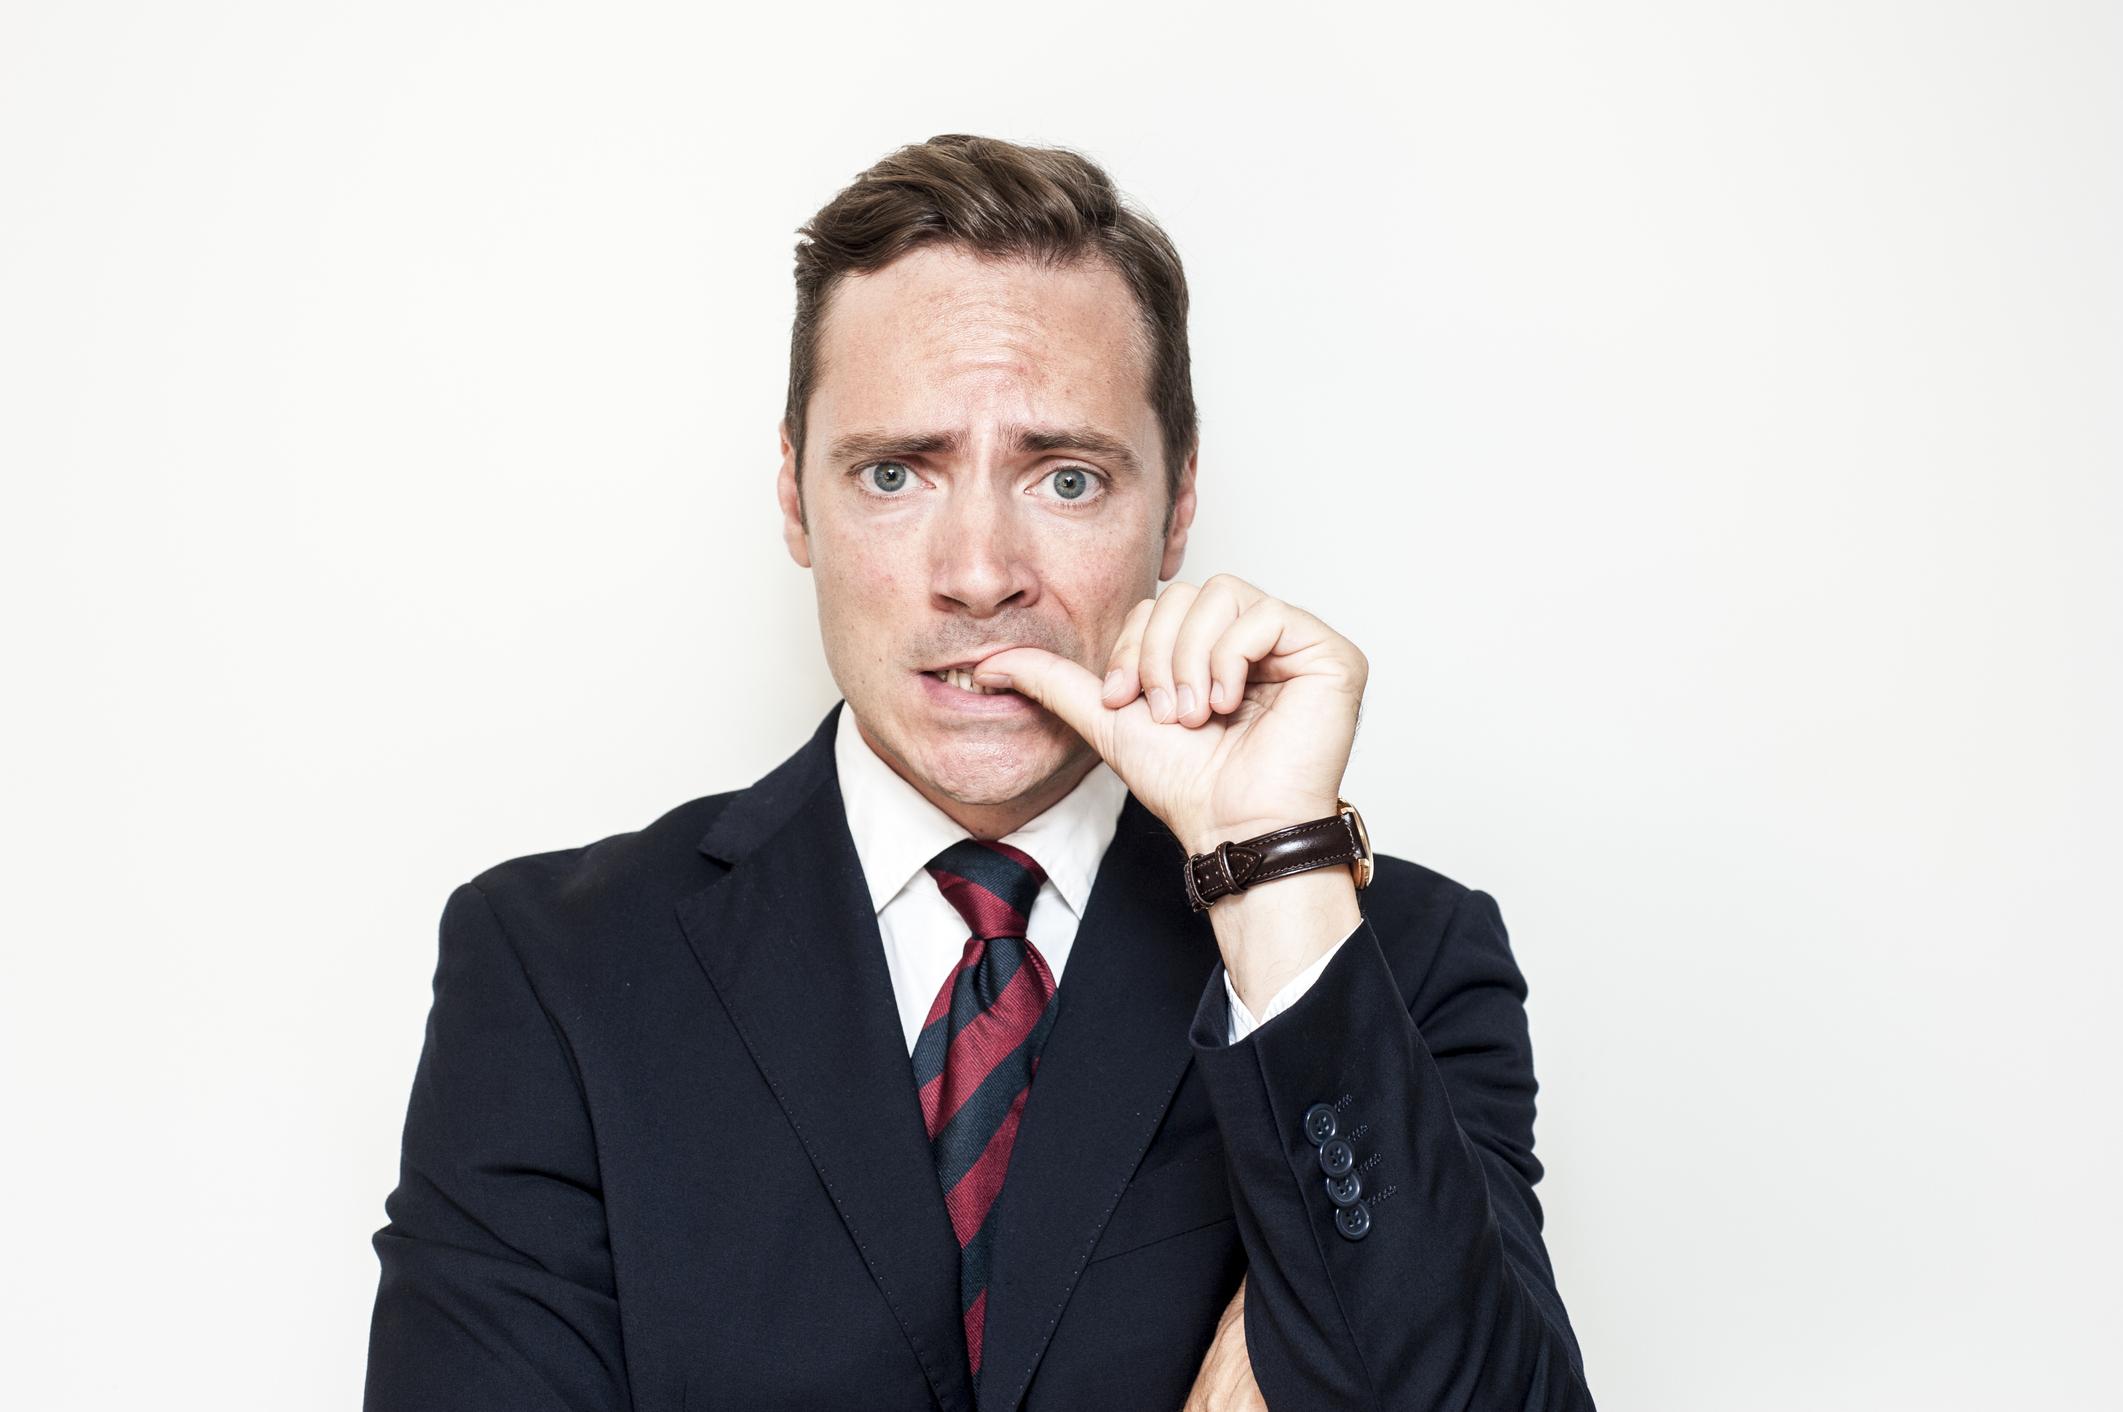 A businessman bites his nails.